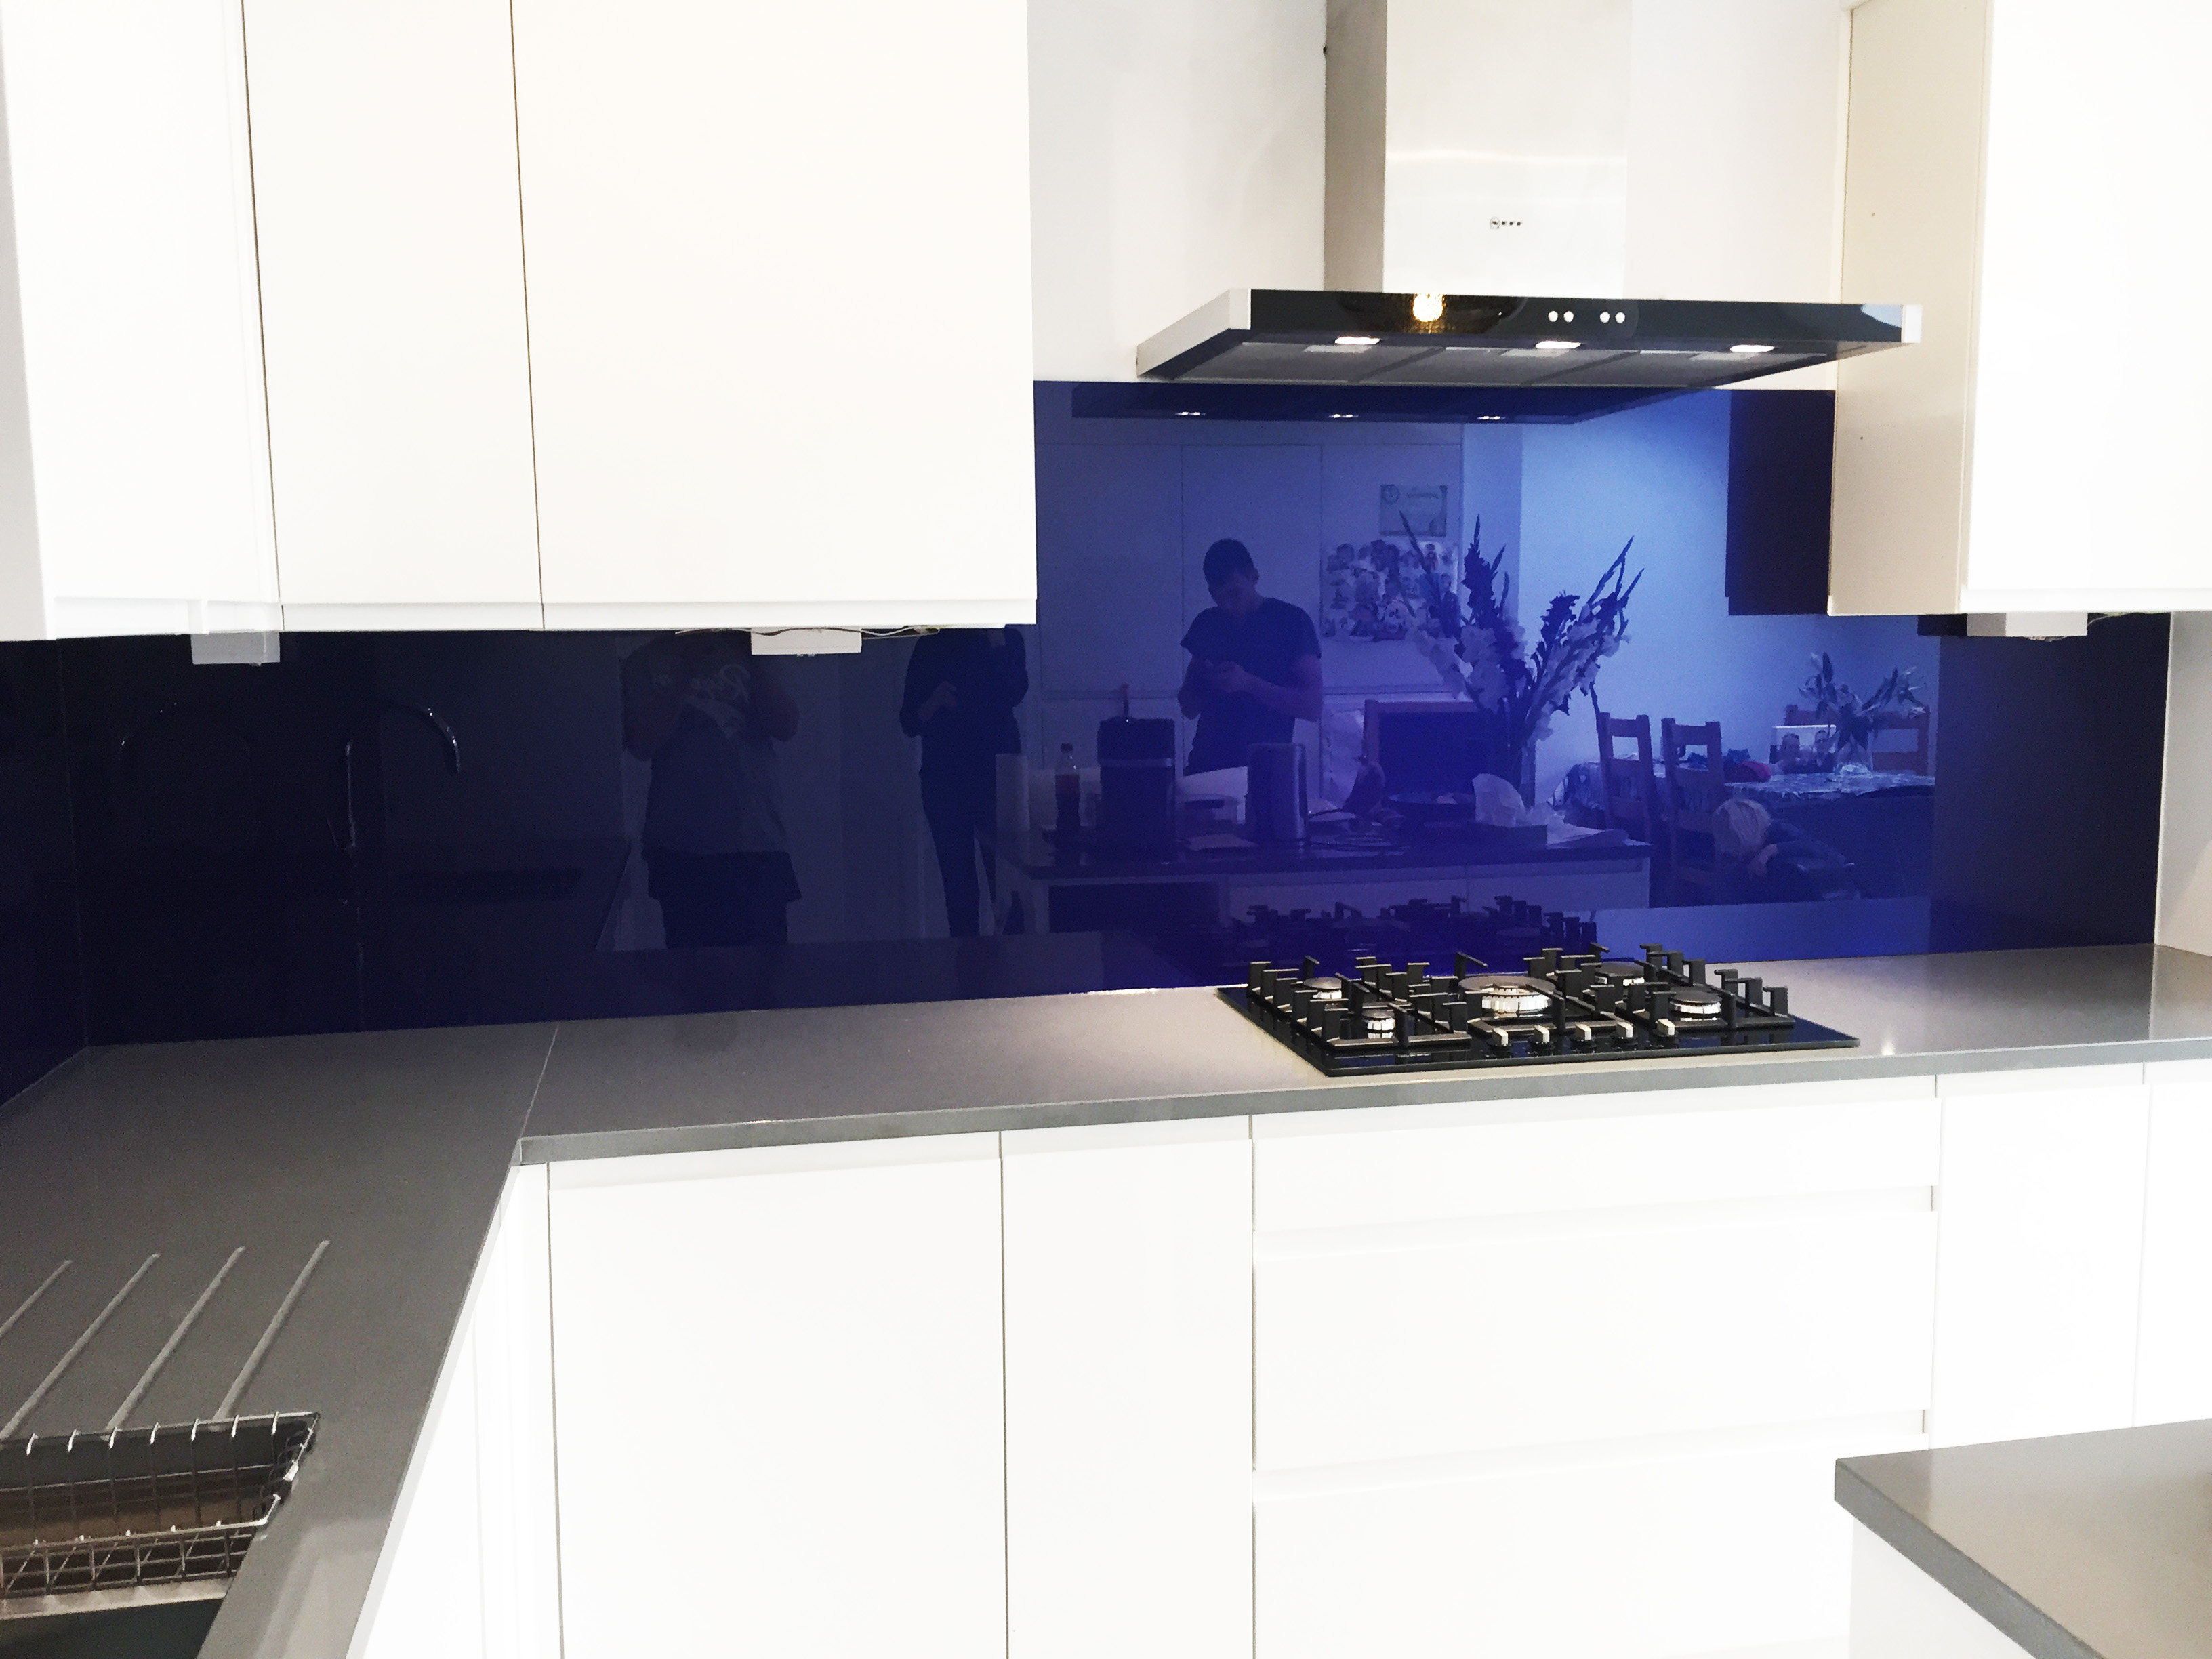 Glass Splashbacks For Kitchens And Interiors 20 Winter